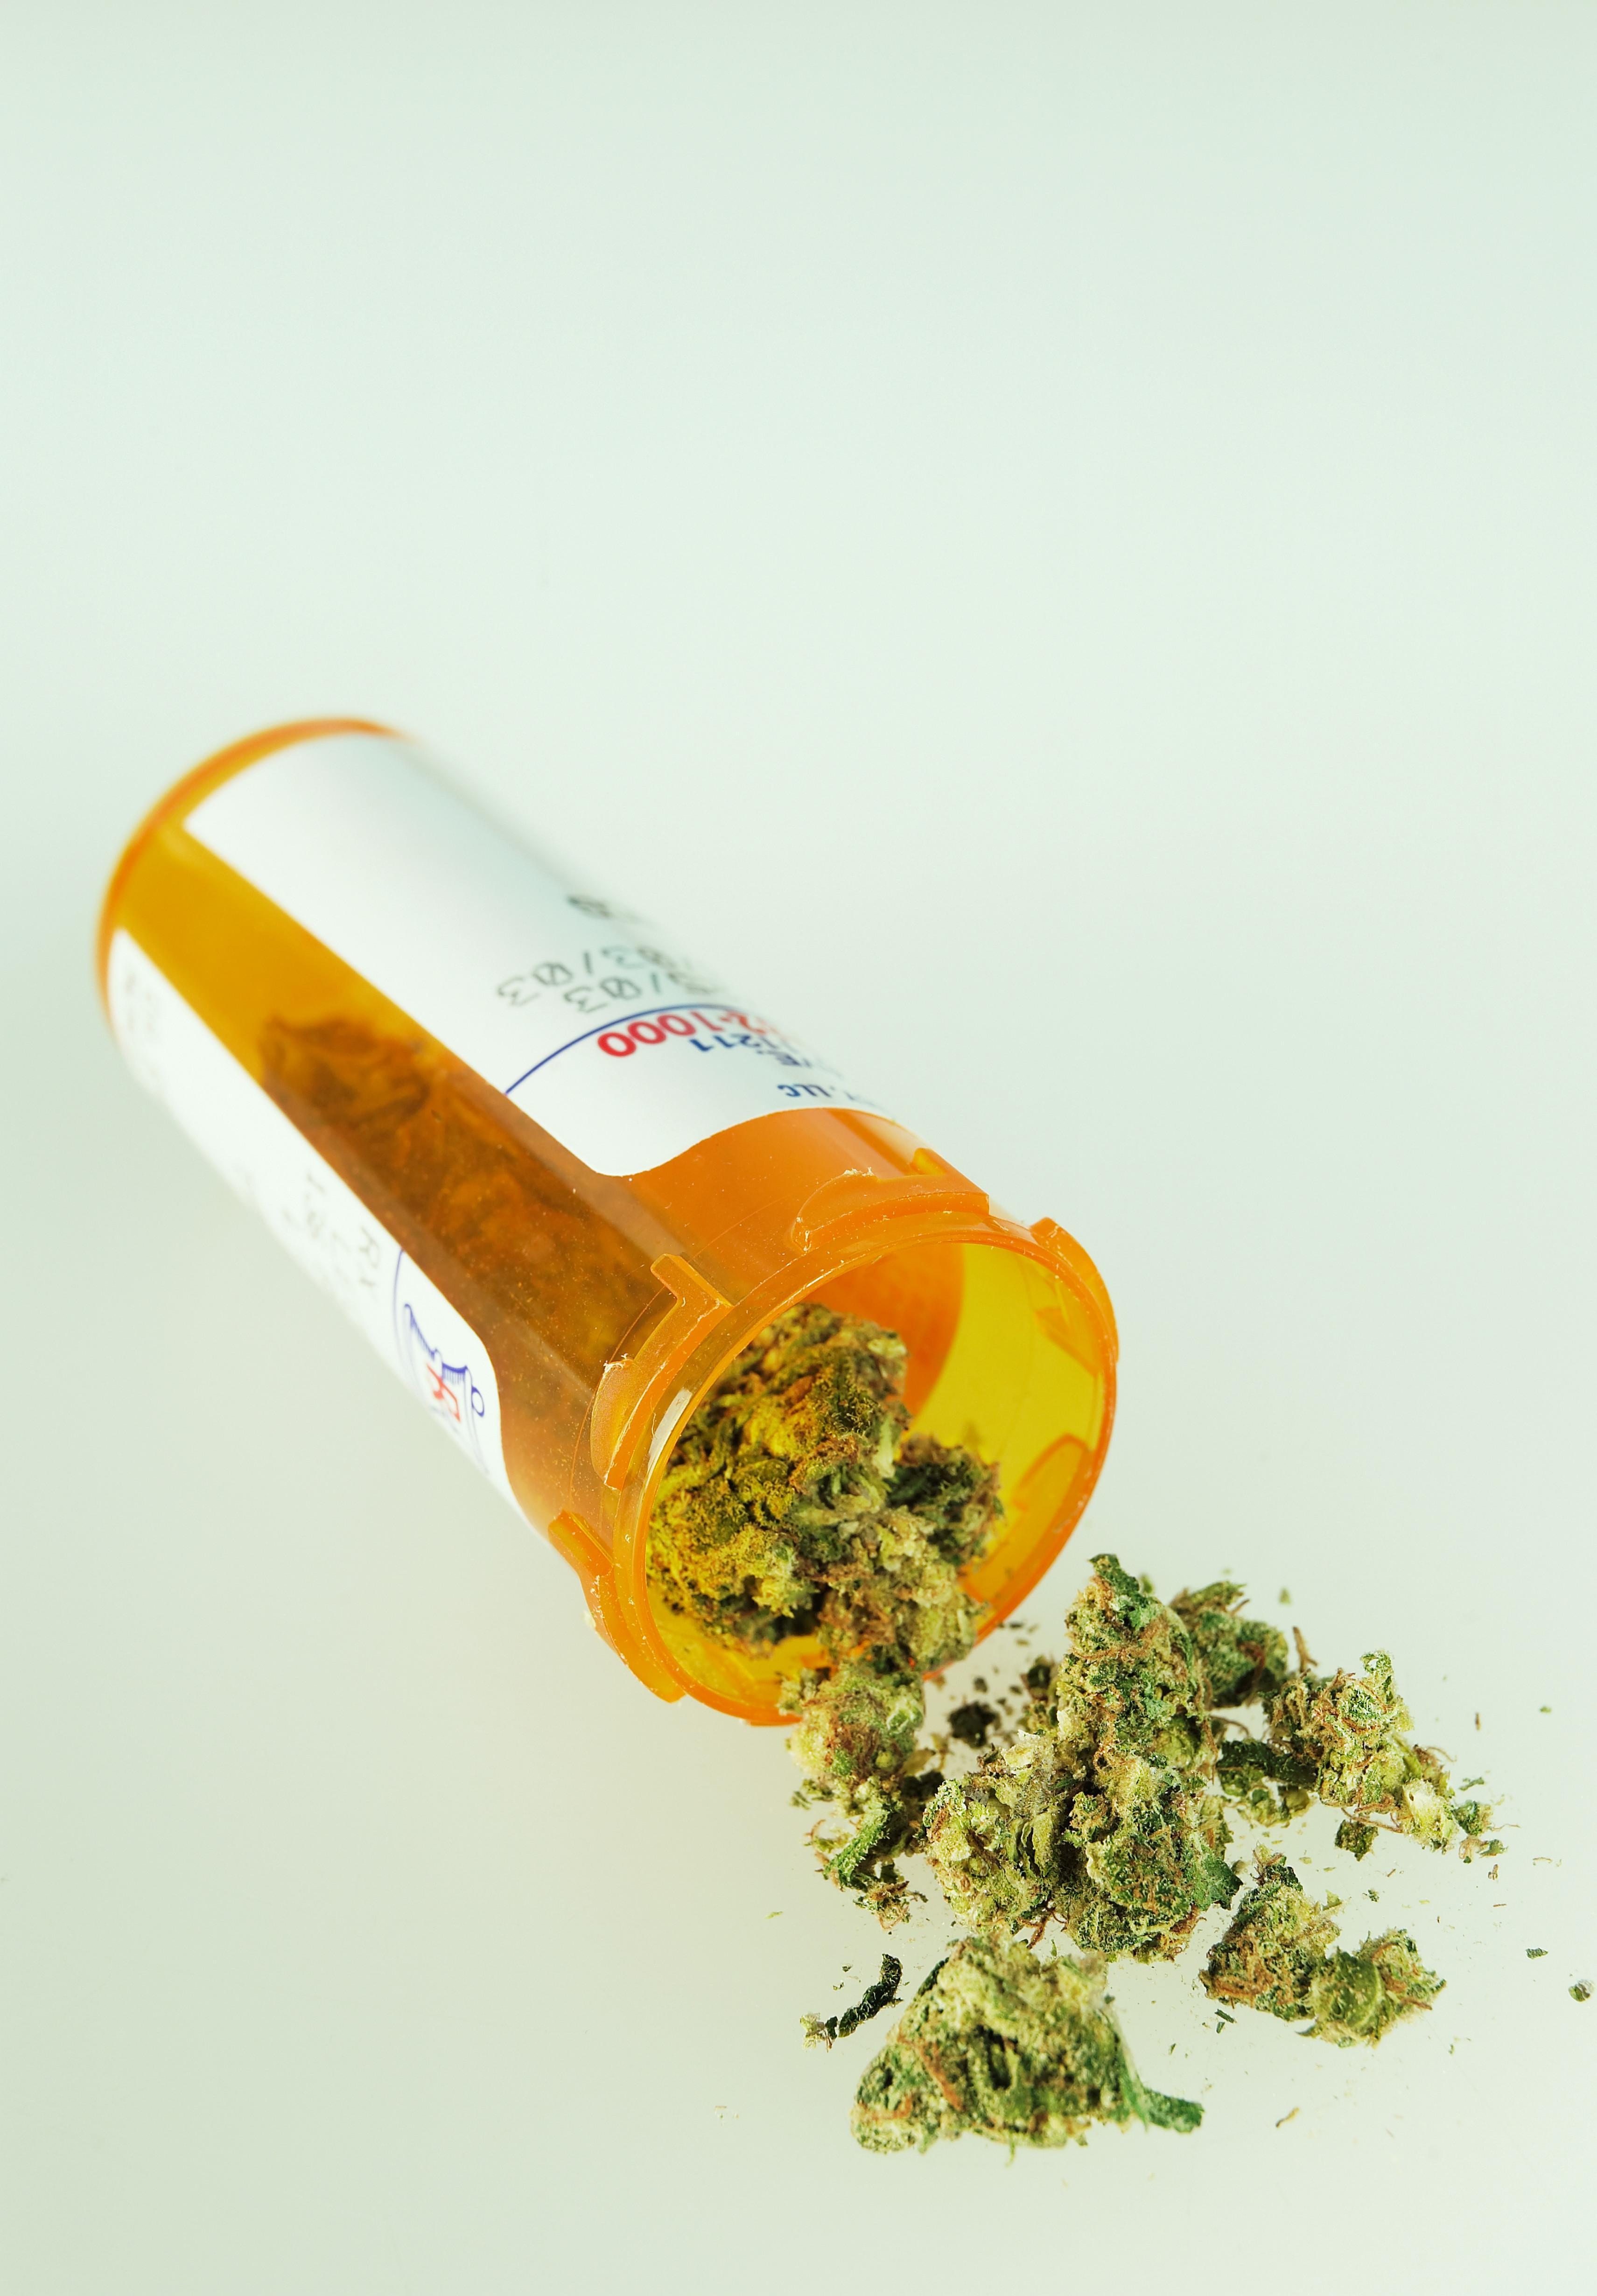 Marijuana spilling out of prescription bottle